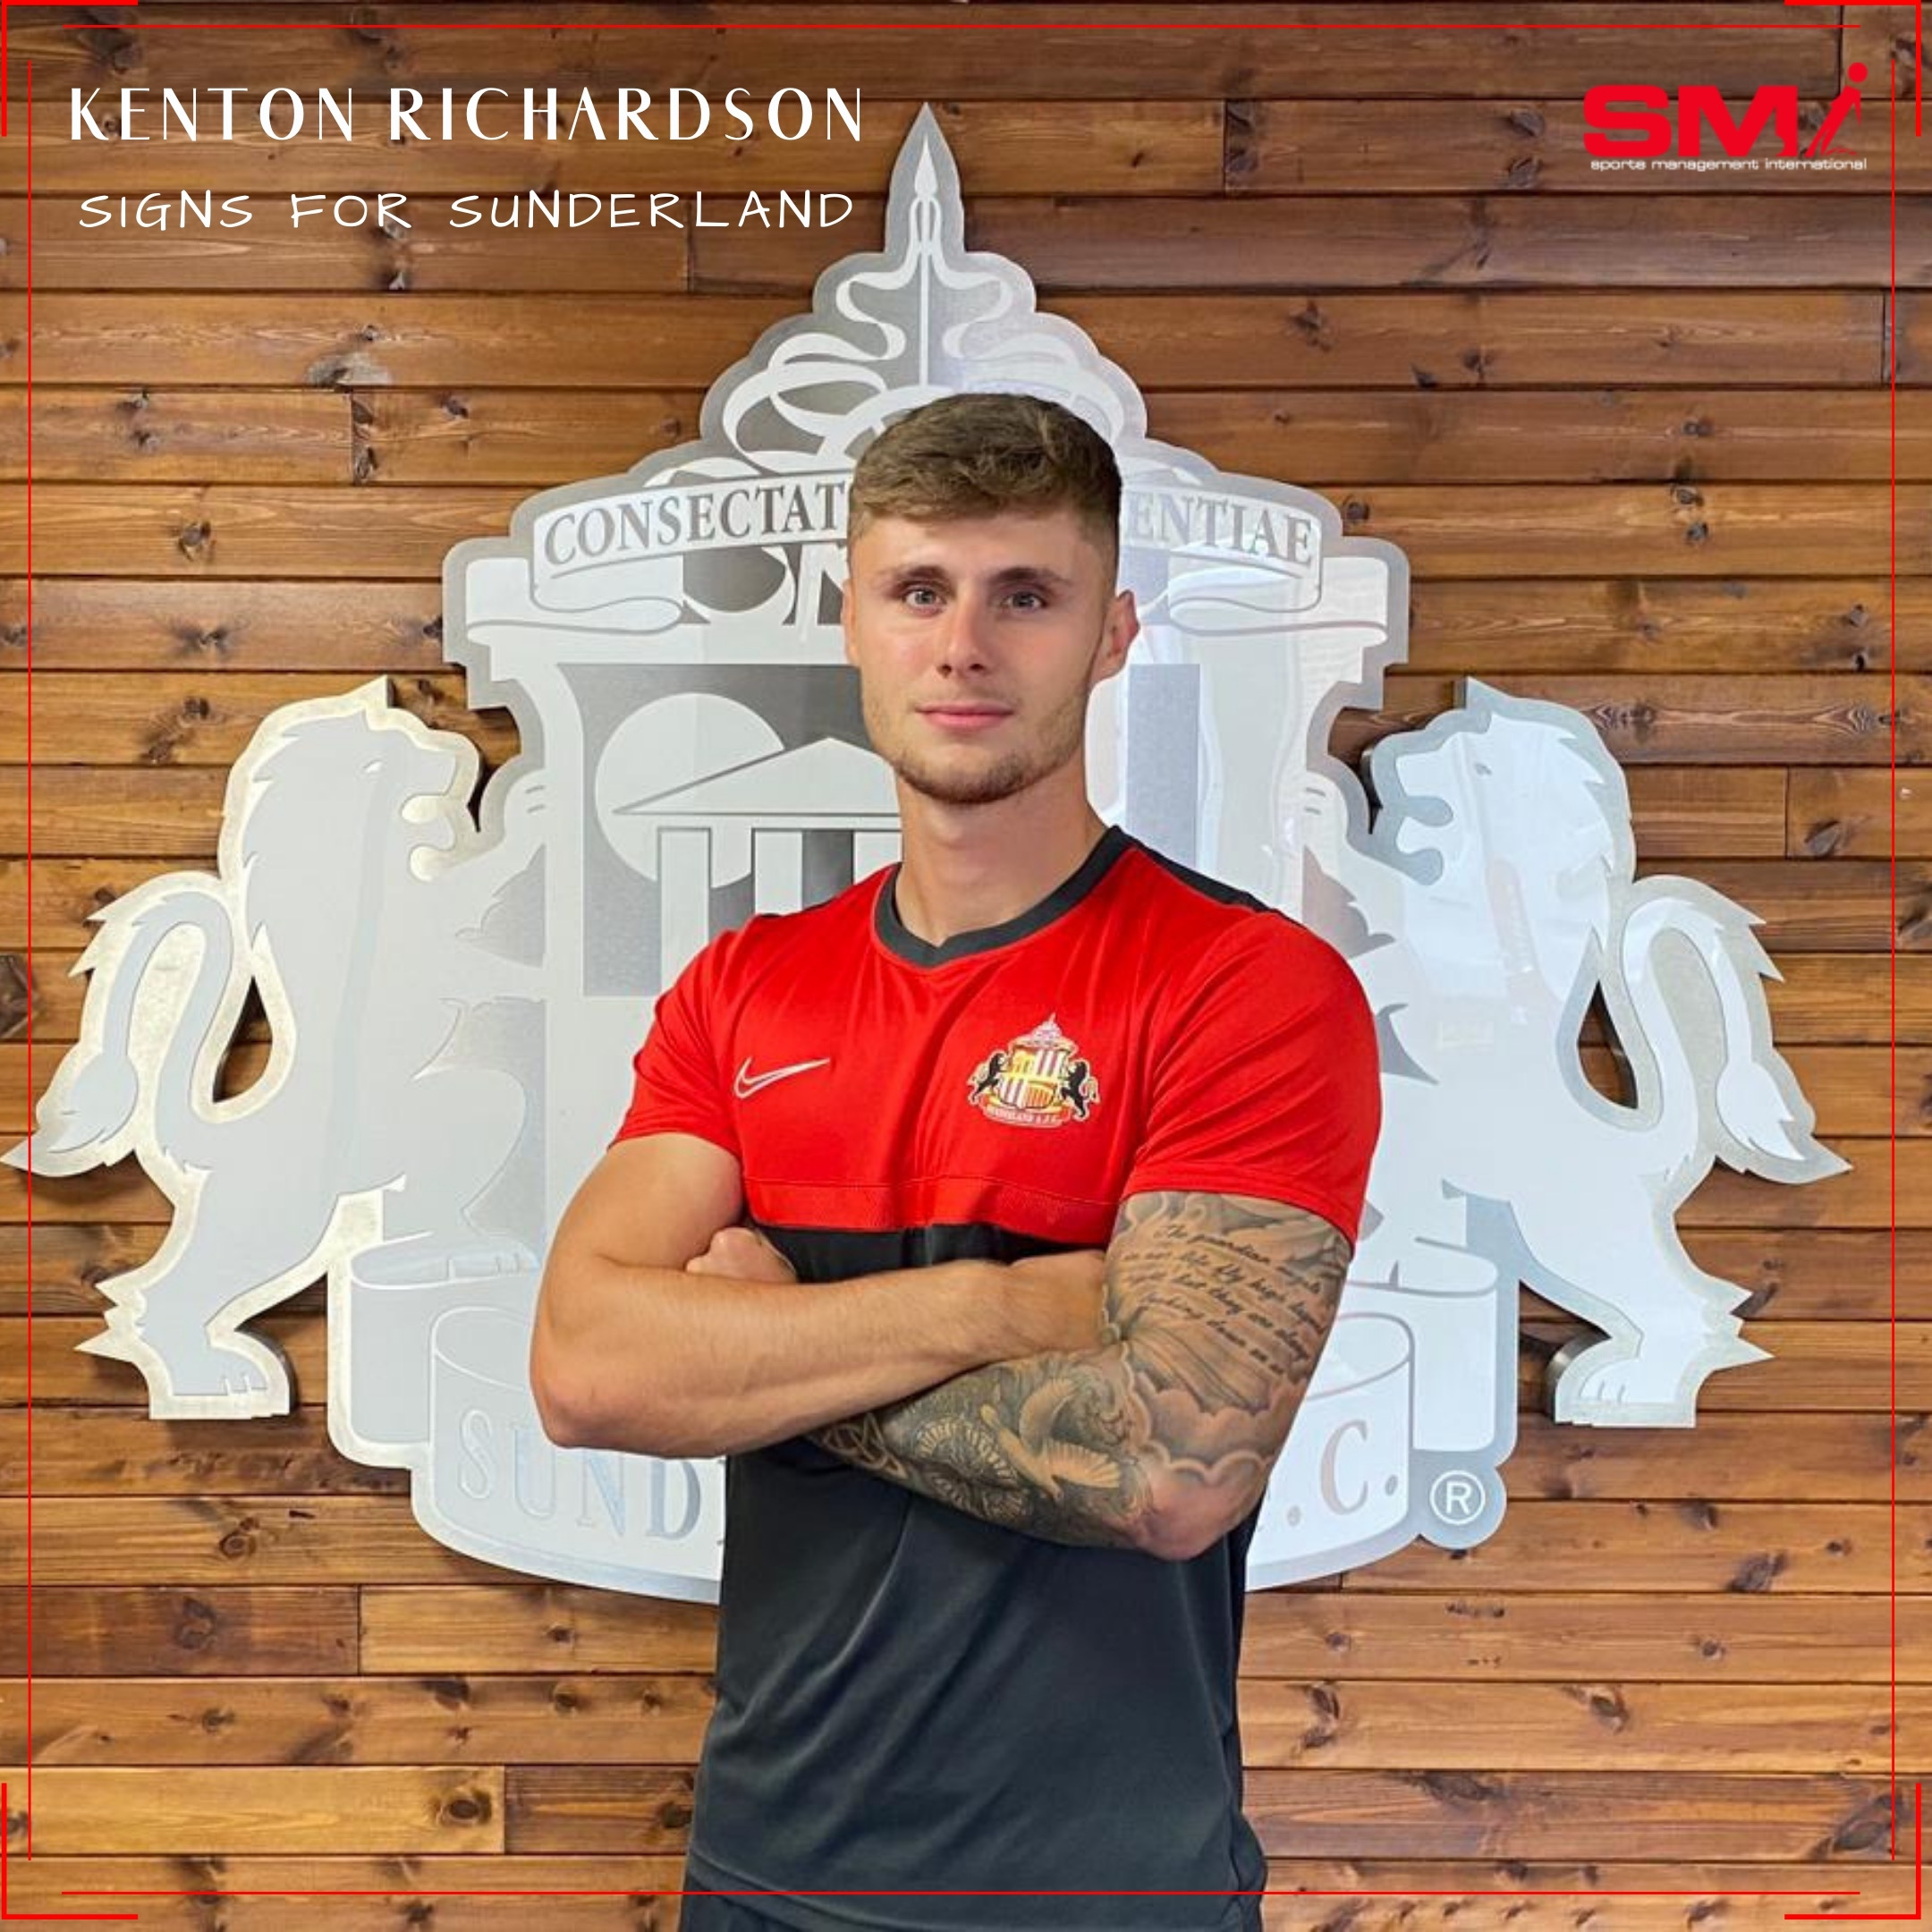 Kenton Richardson to Sunderland